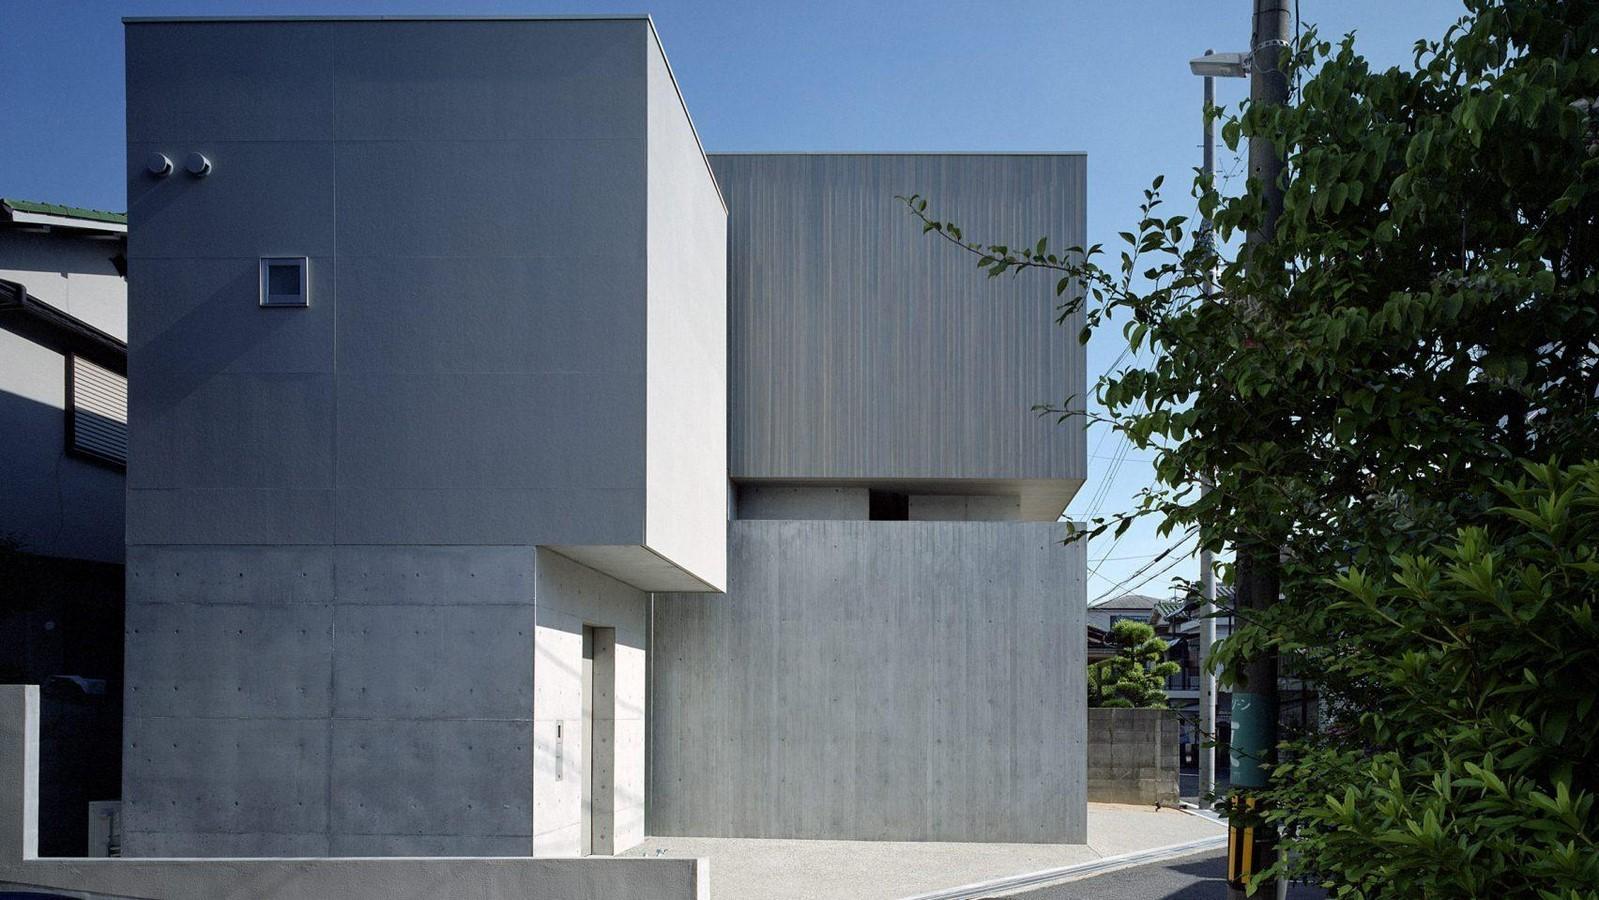 House in Toyonaka, OsakabyFujiwaraMuro Architects - Sheet1